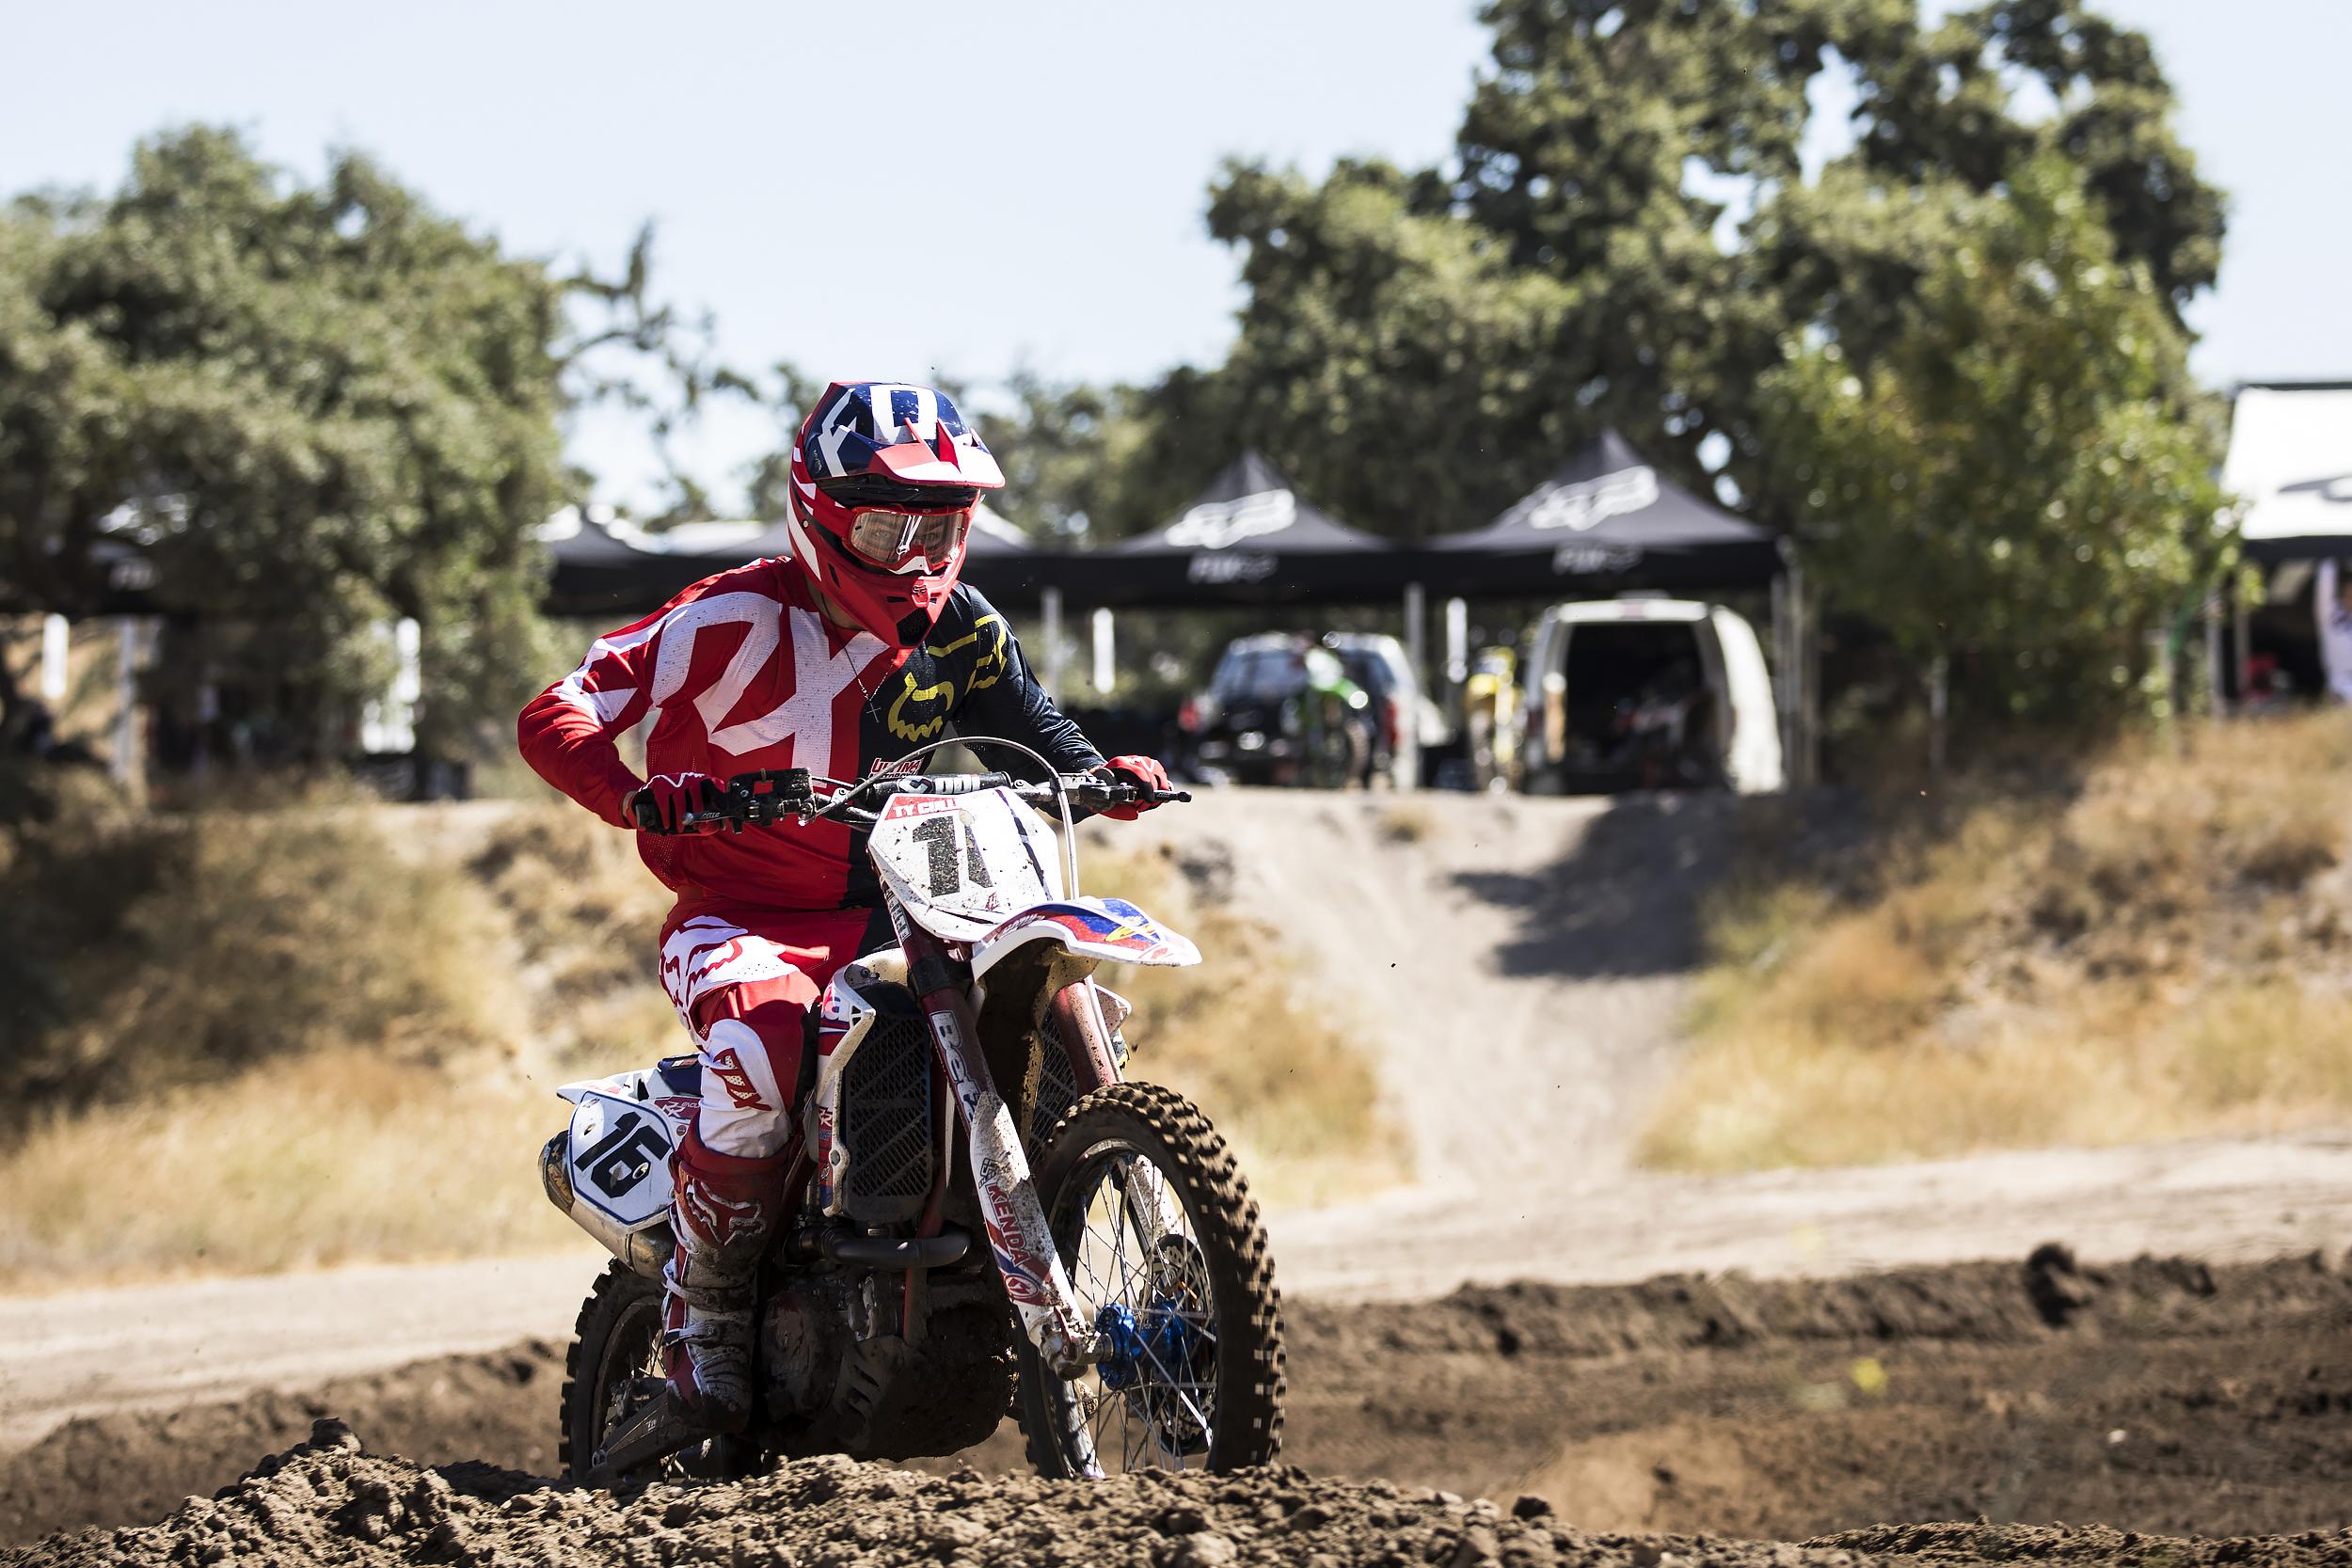 2018 Fox Motocross Apparel Test